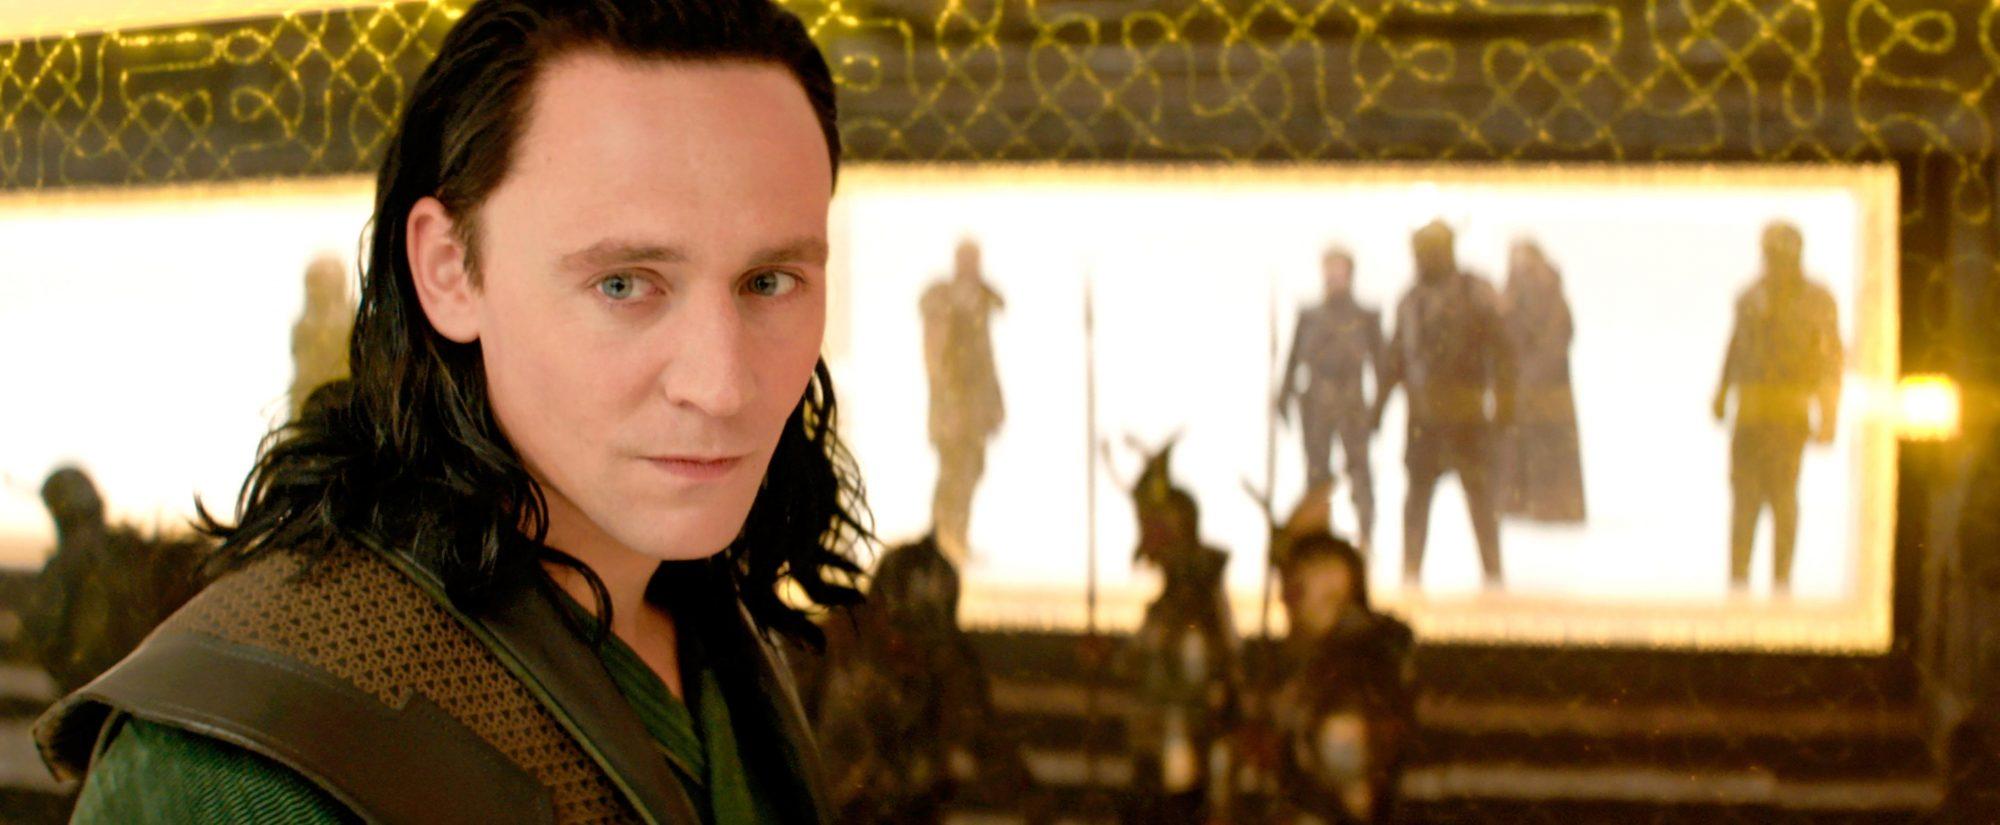 Thor: The Dark World (2013)Loki (Tom Hiddleston)